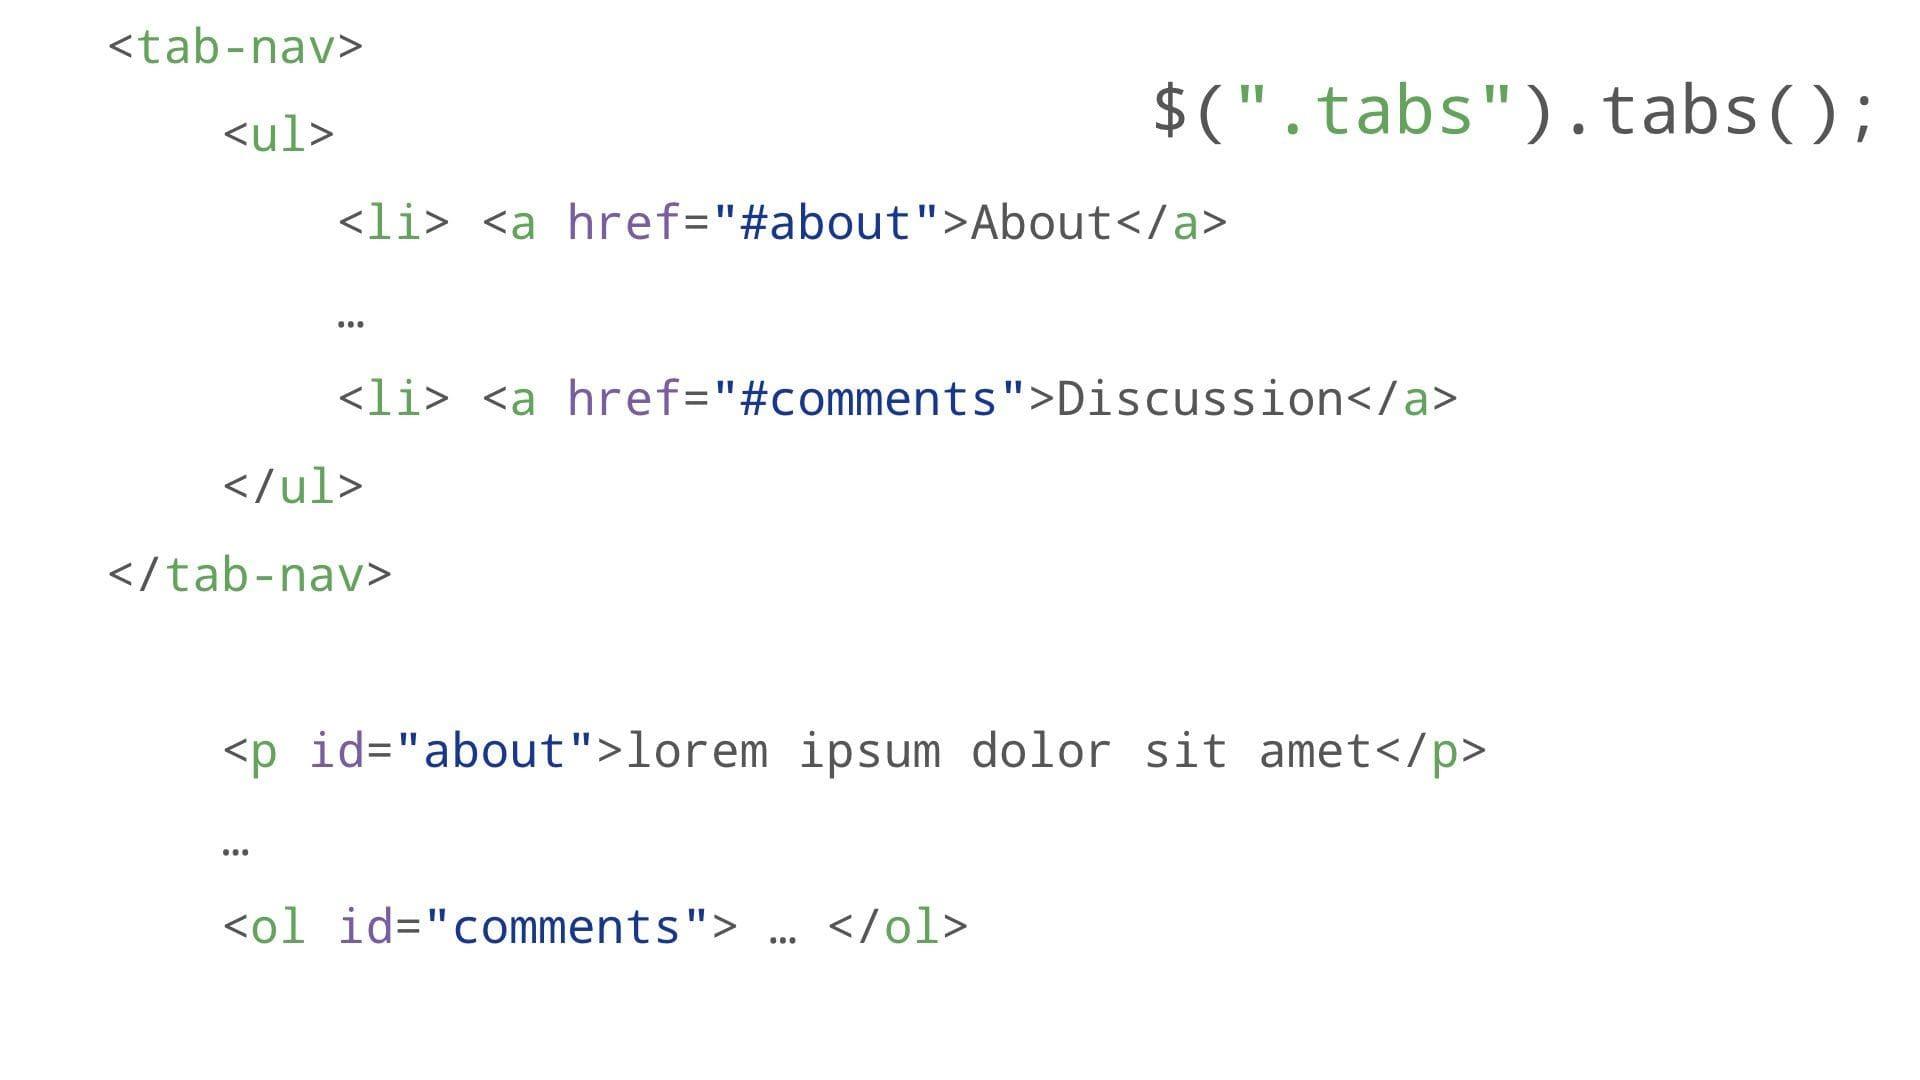 tabs markup with tab-nav